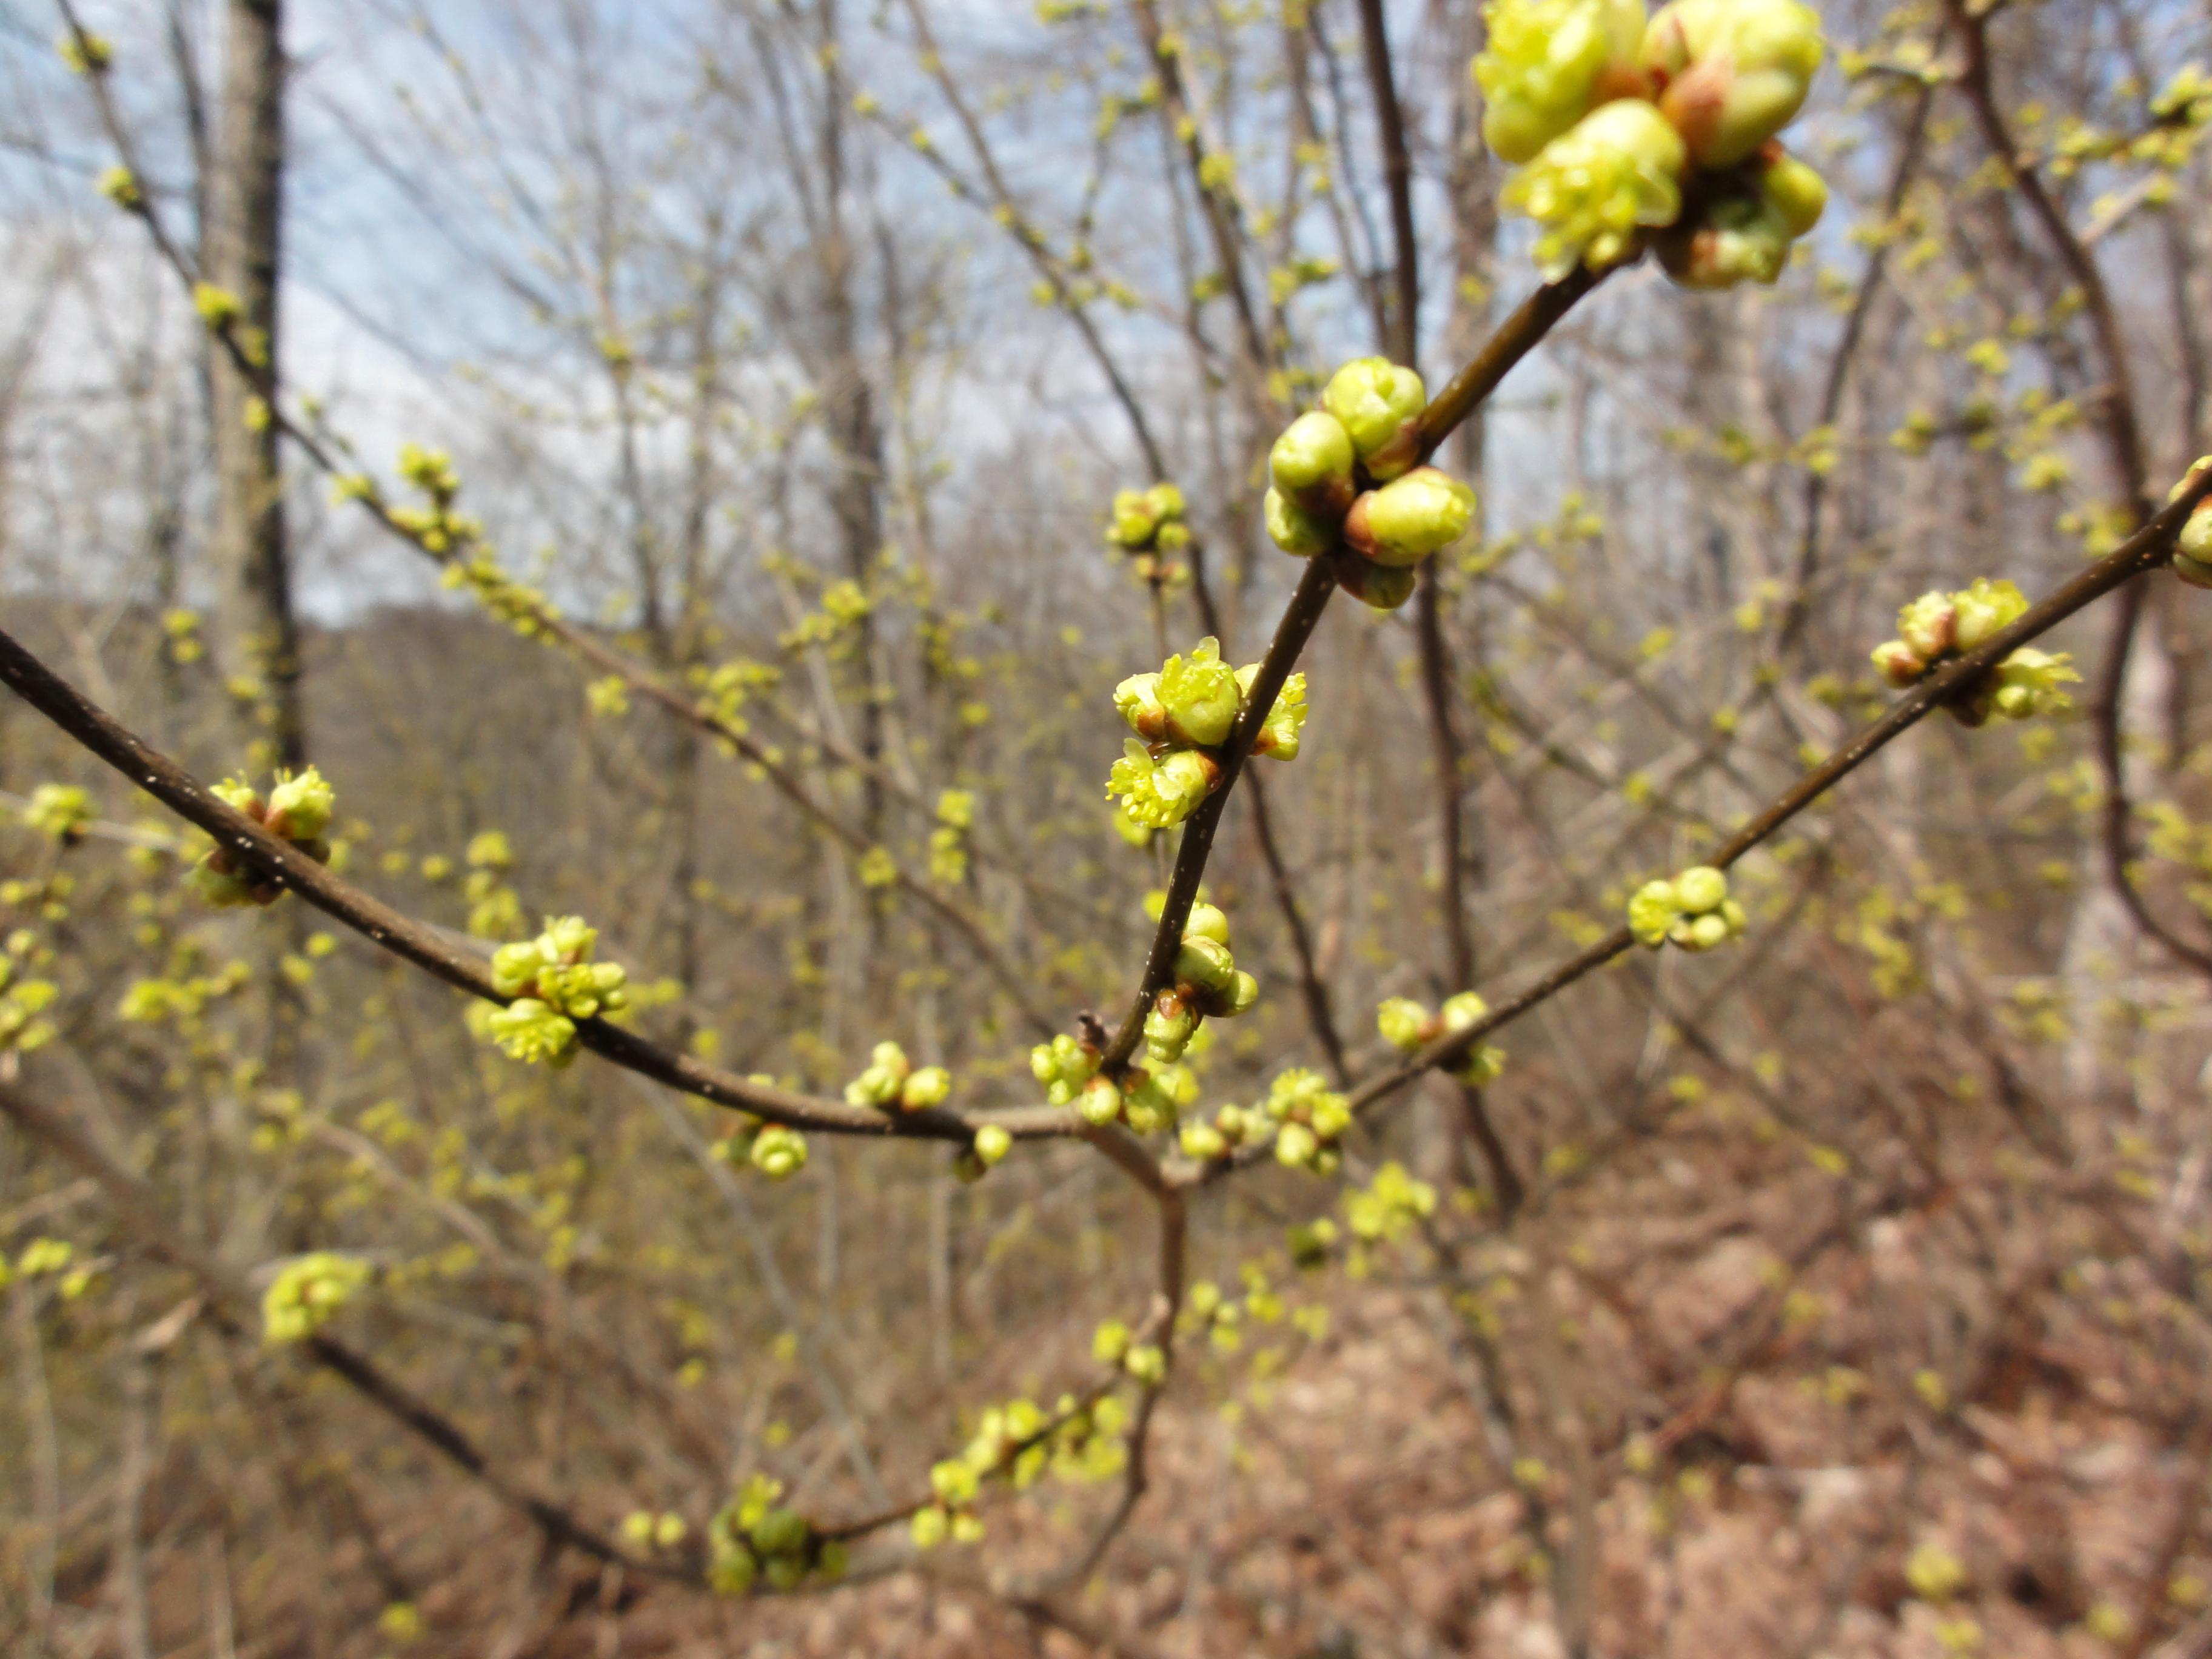 Image of northern spicebush